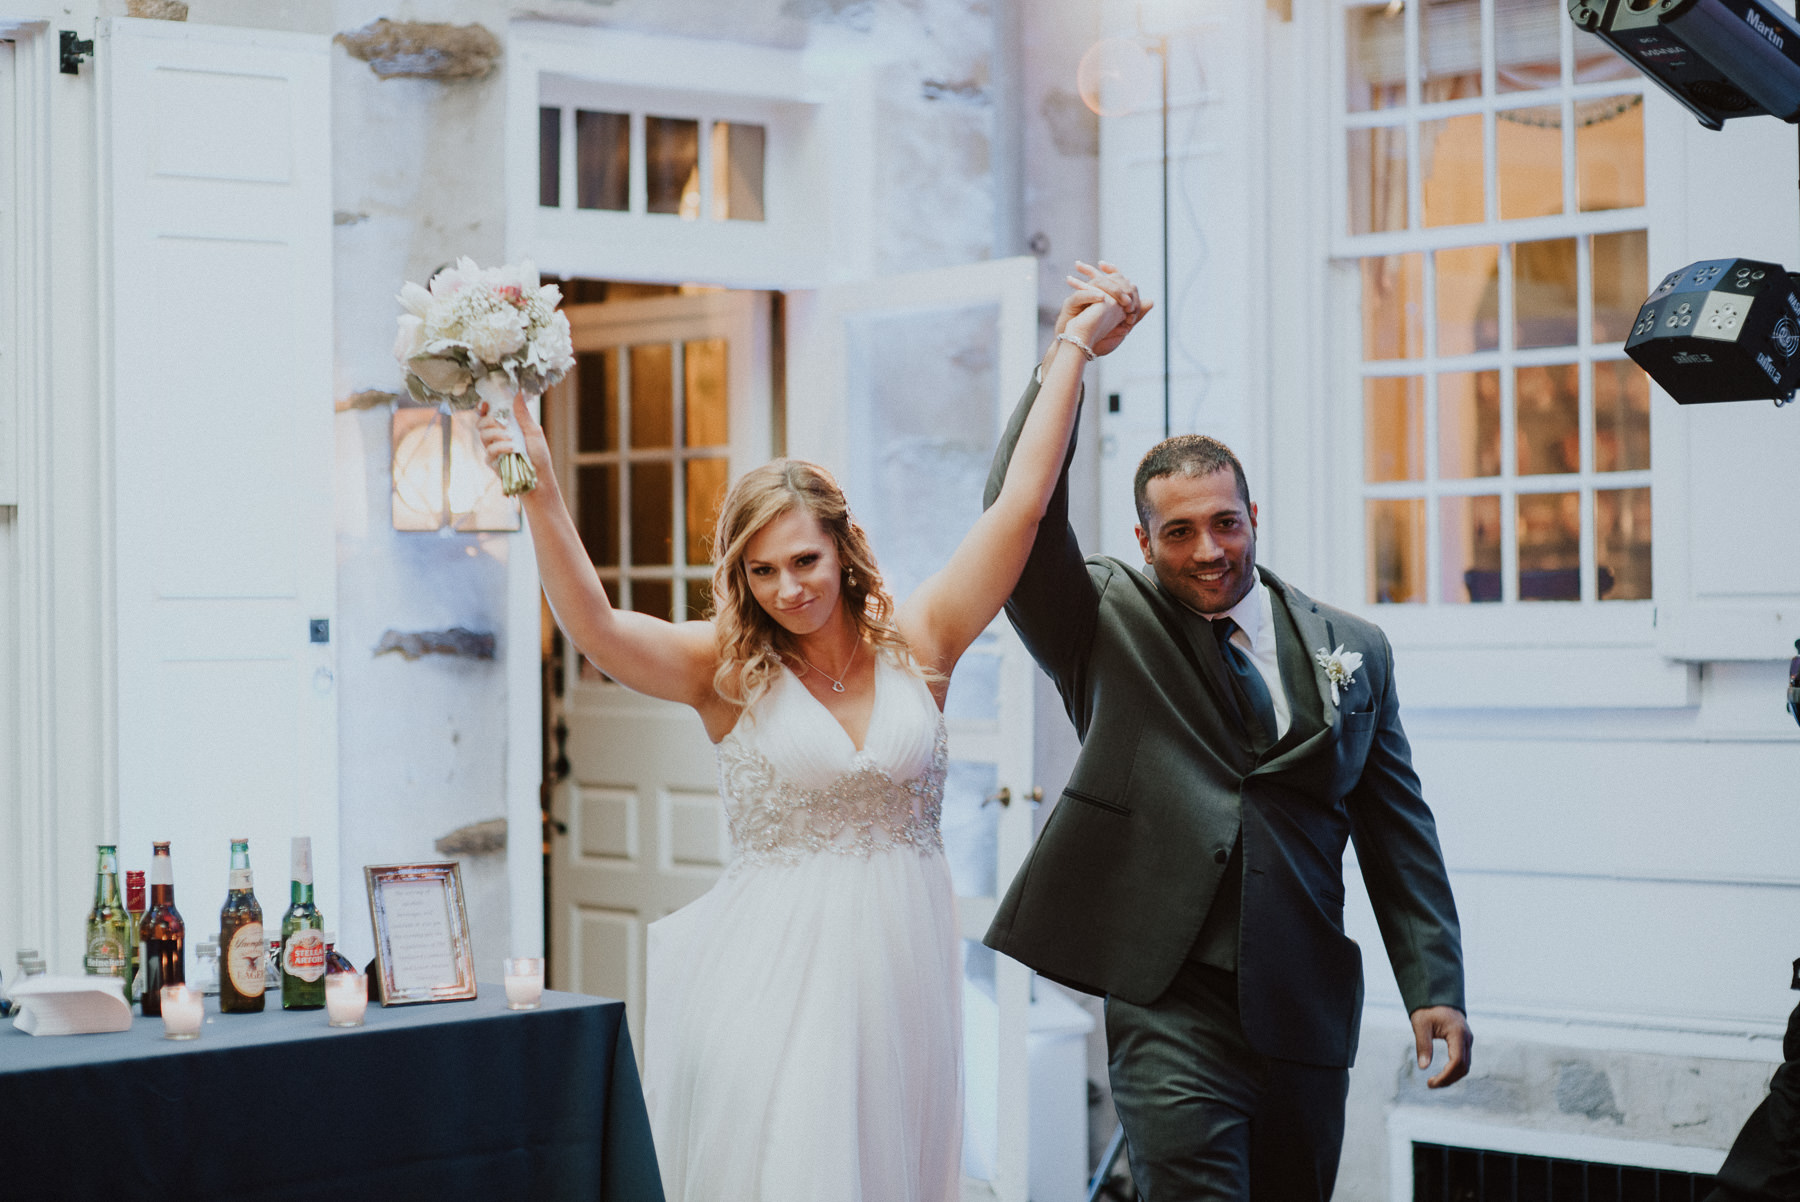 appleford-estate-wedding-photography-81.jpg